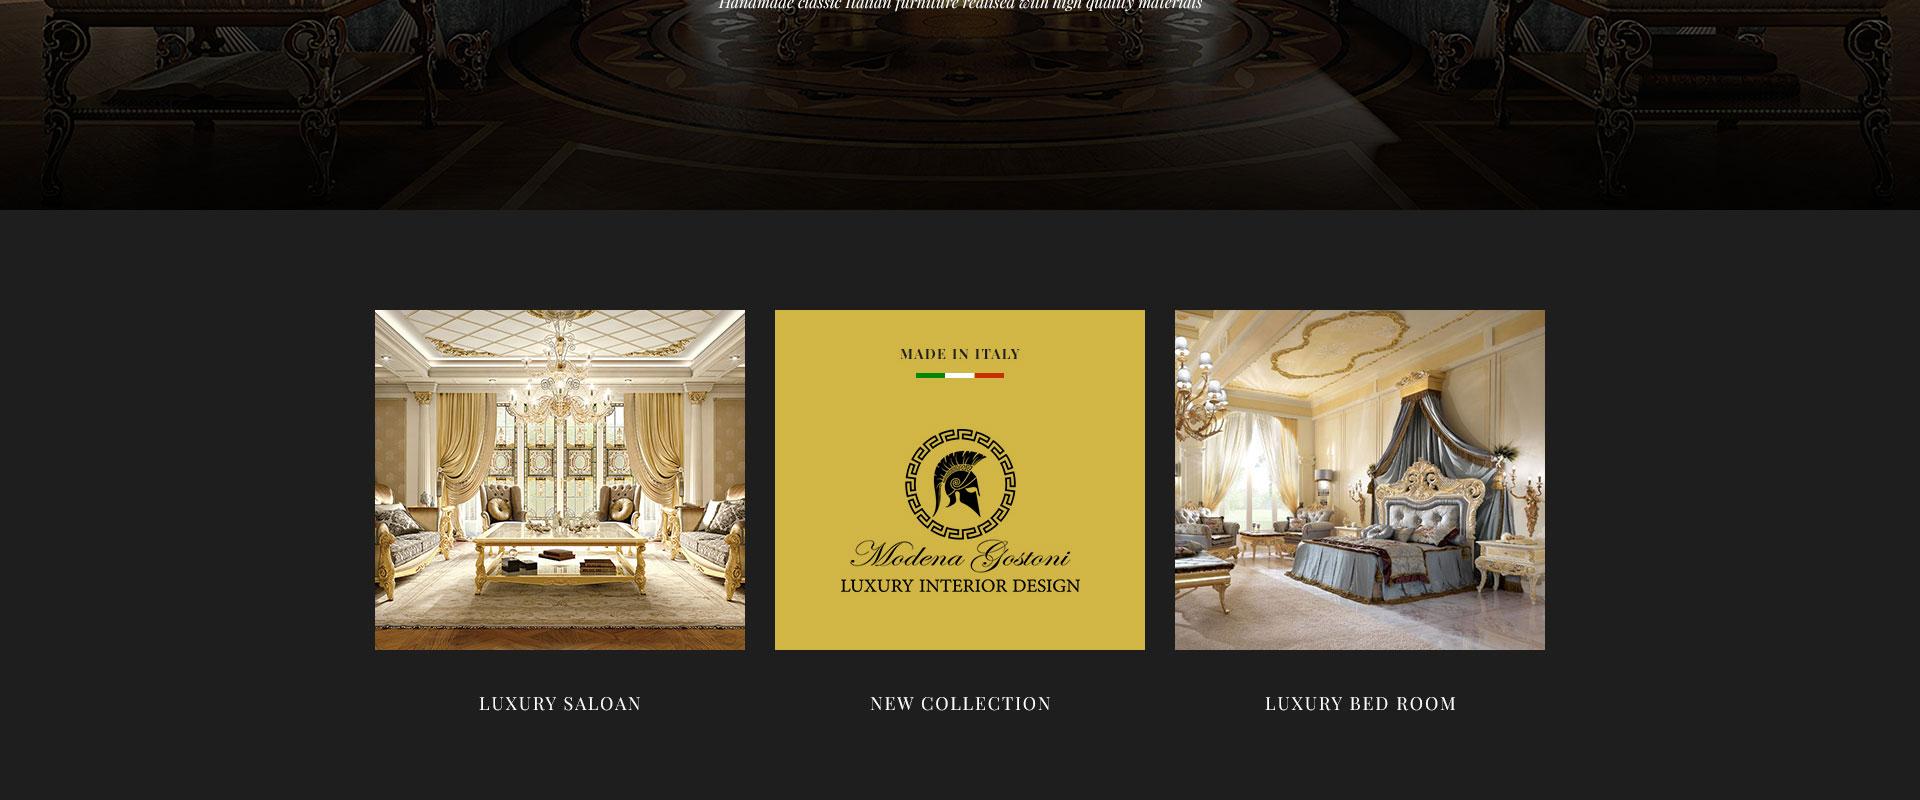 Modena Gastoni Interior Design Qatar